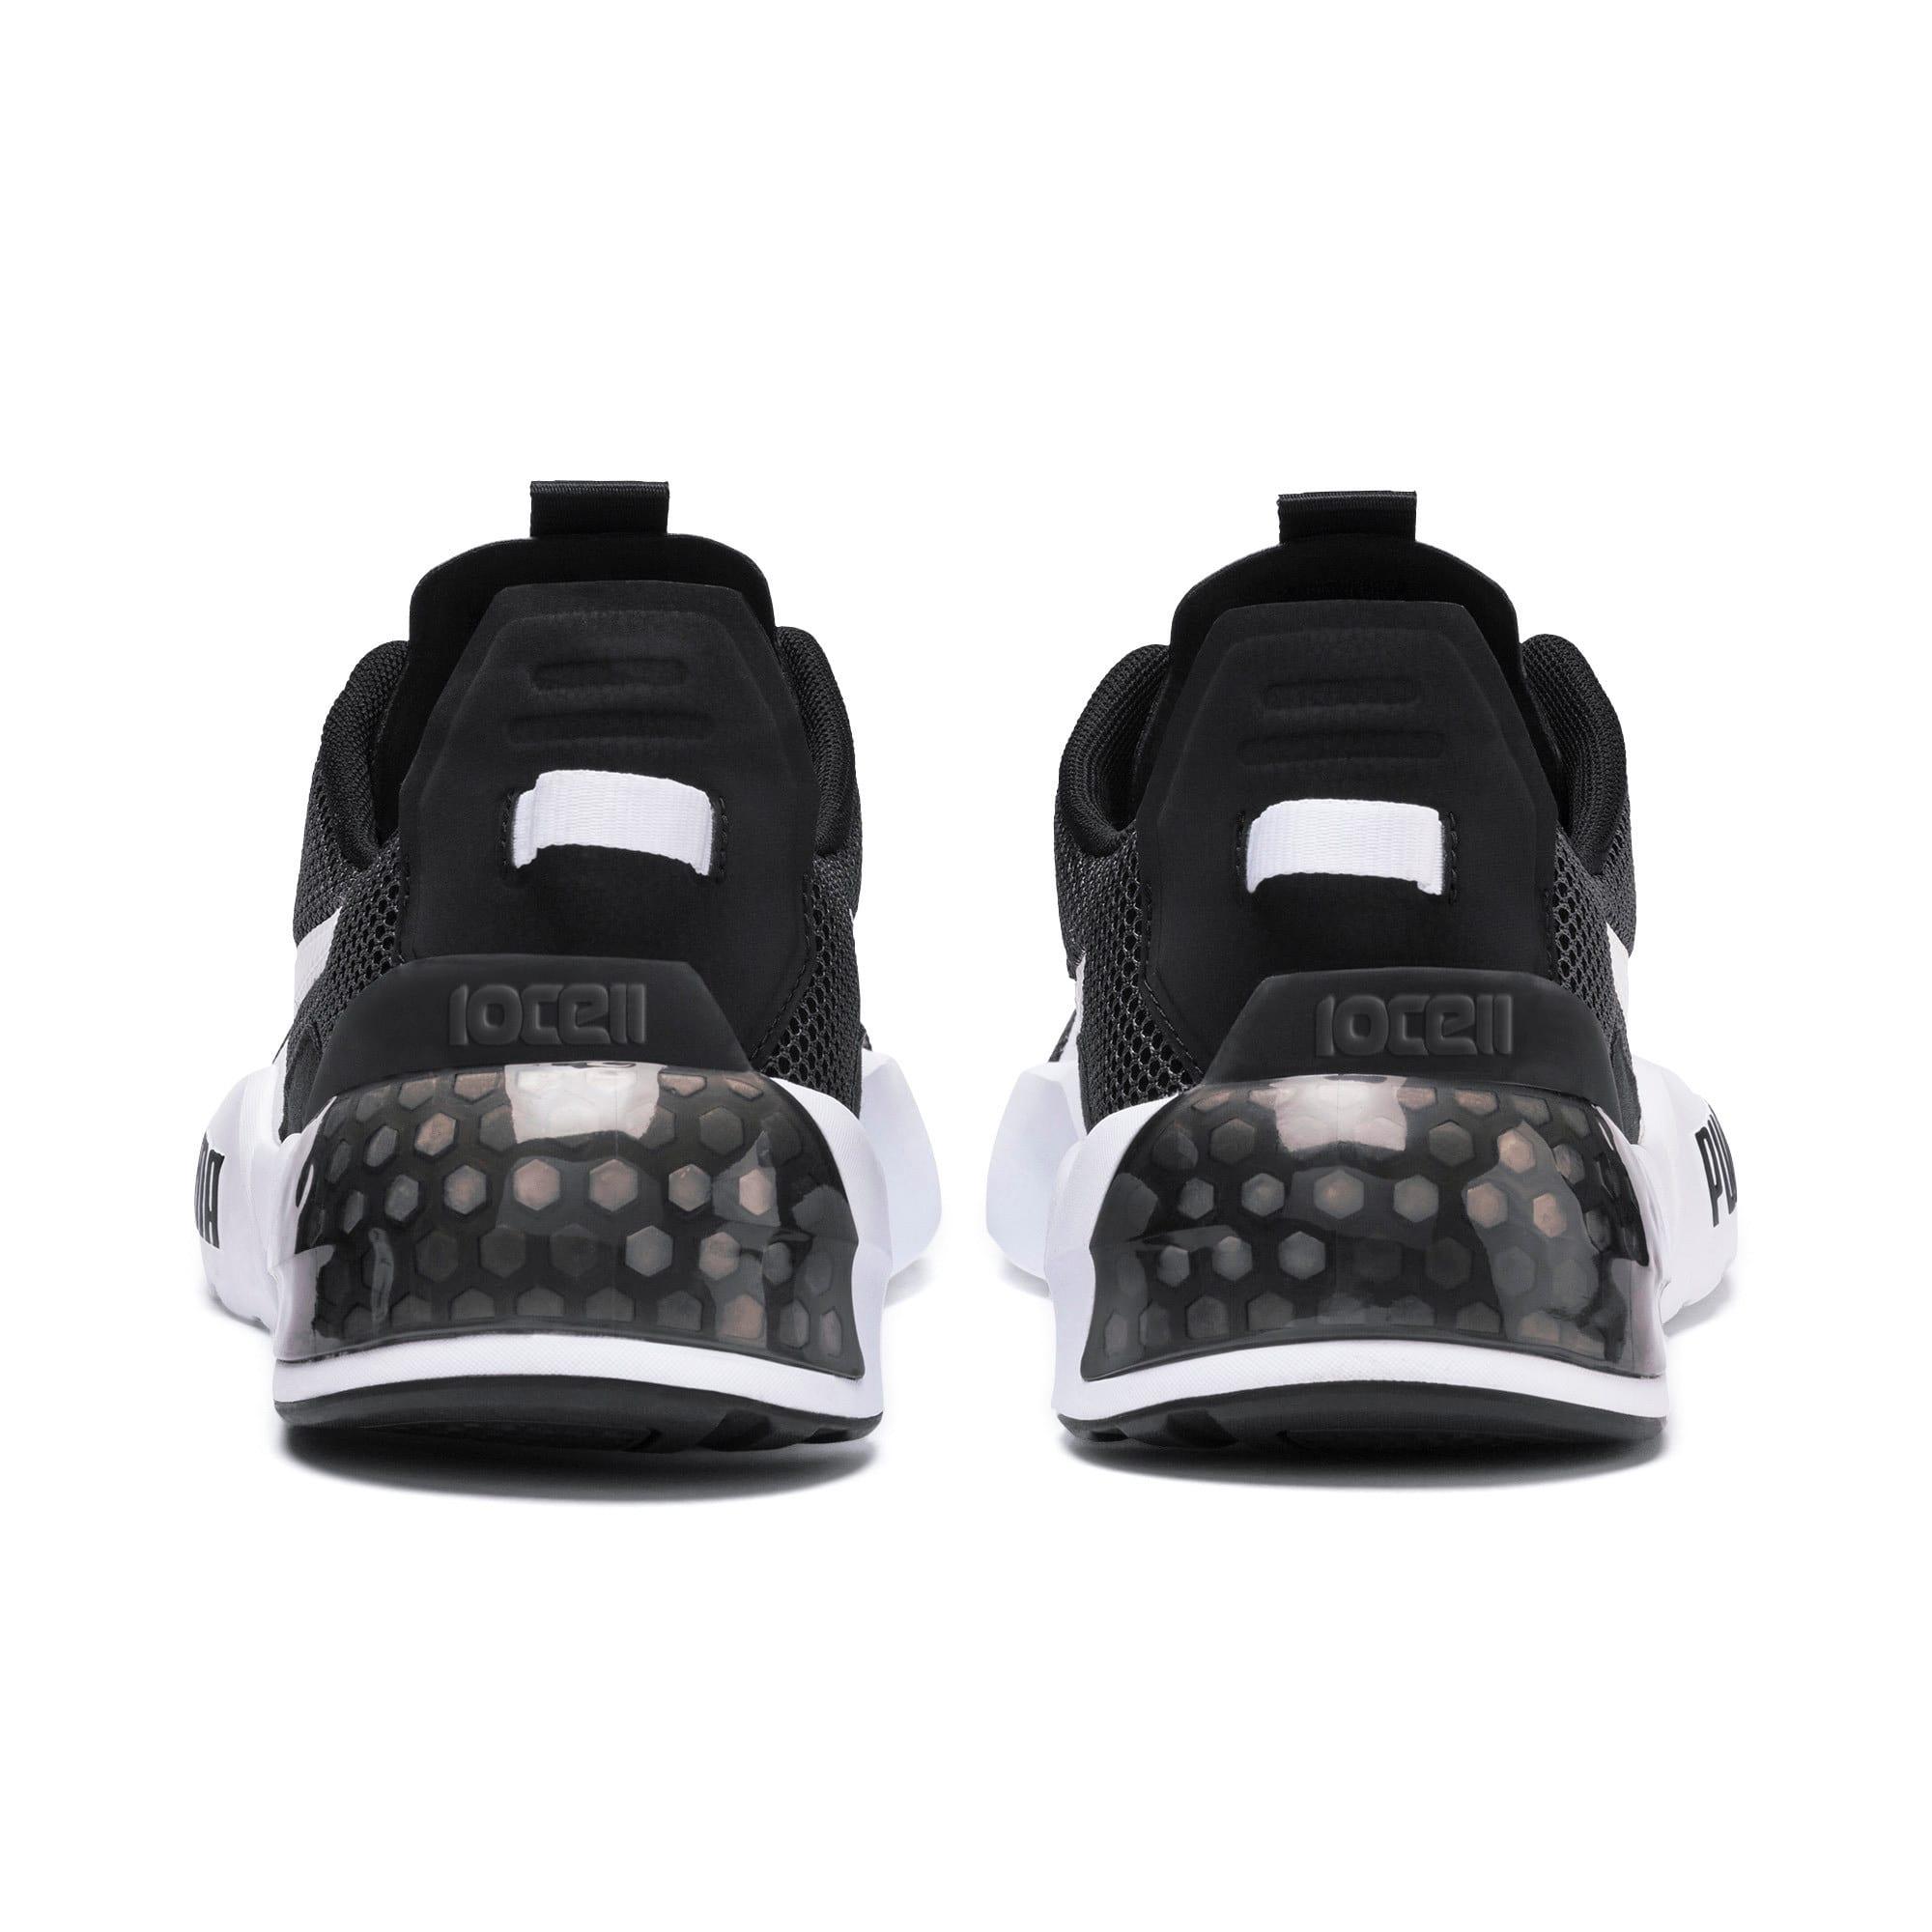 Thumbnail 4 of CELL Phase Men's Training Shoes, Puma Black-Puma White, medium